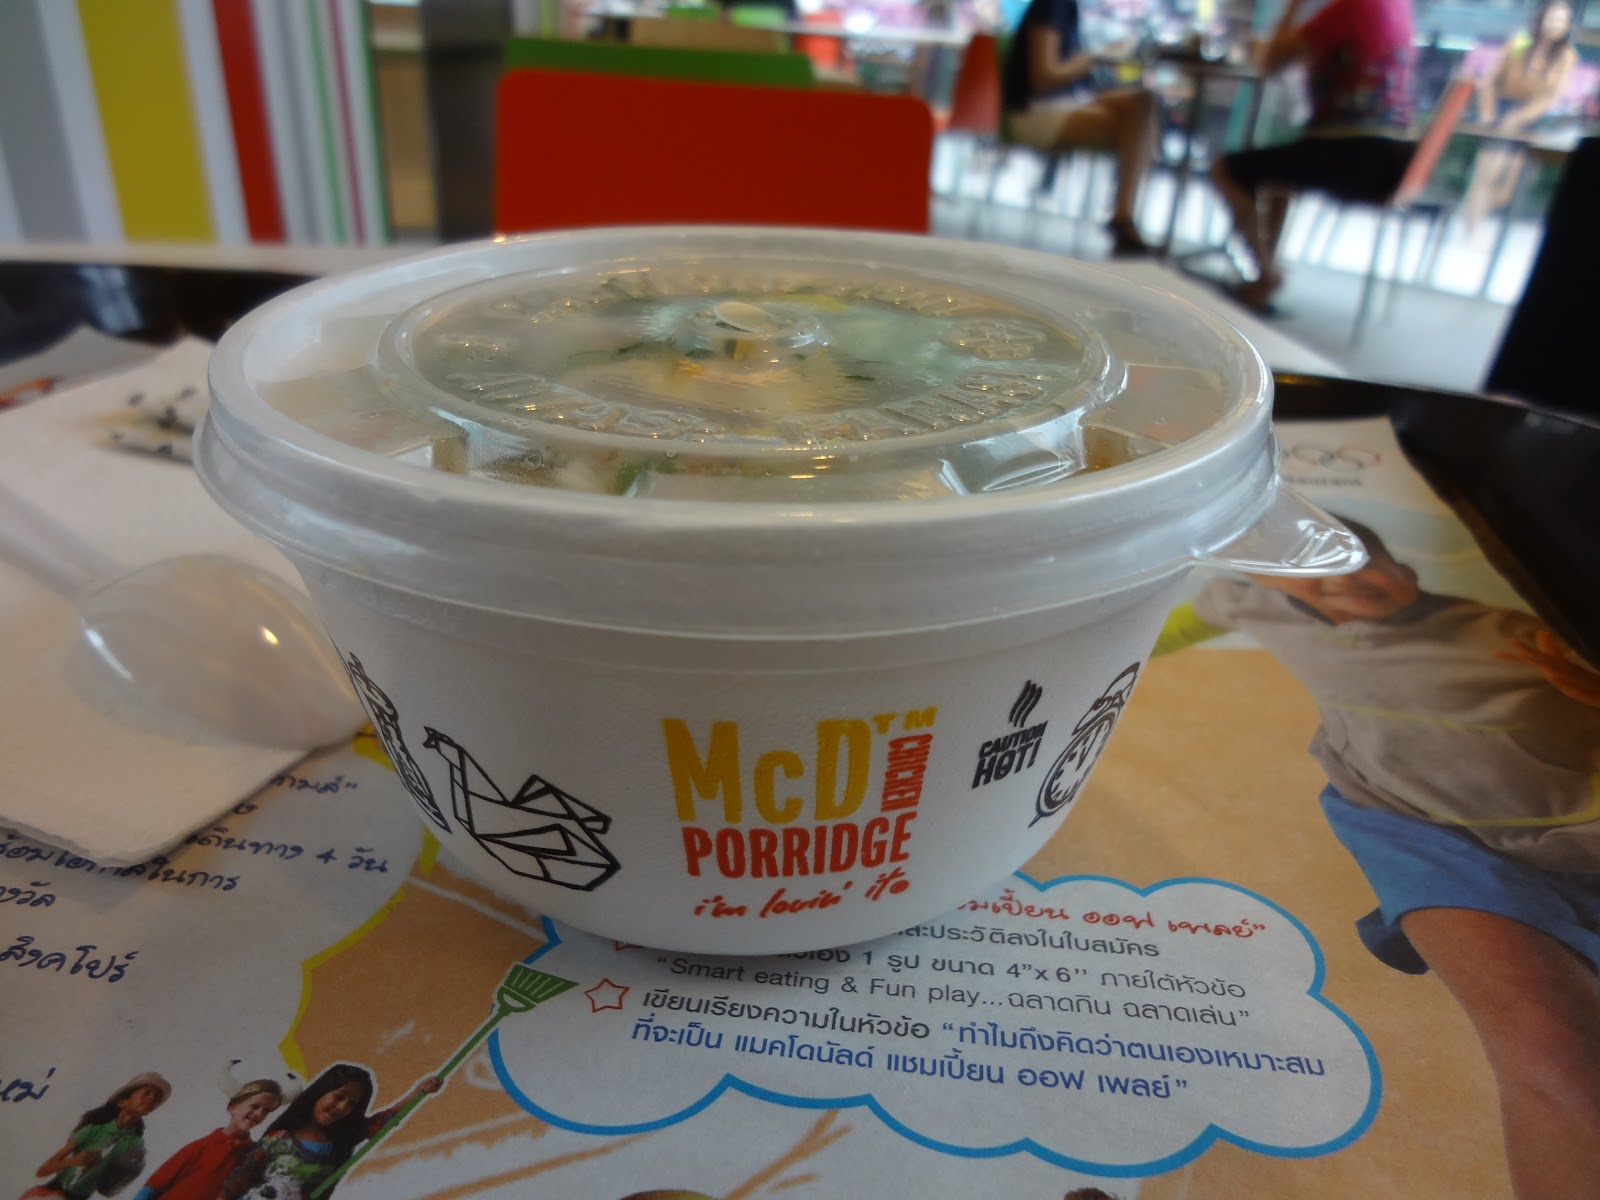 McDonald's porridge Malaysia